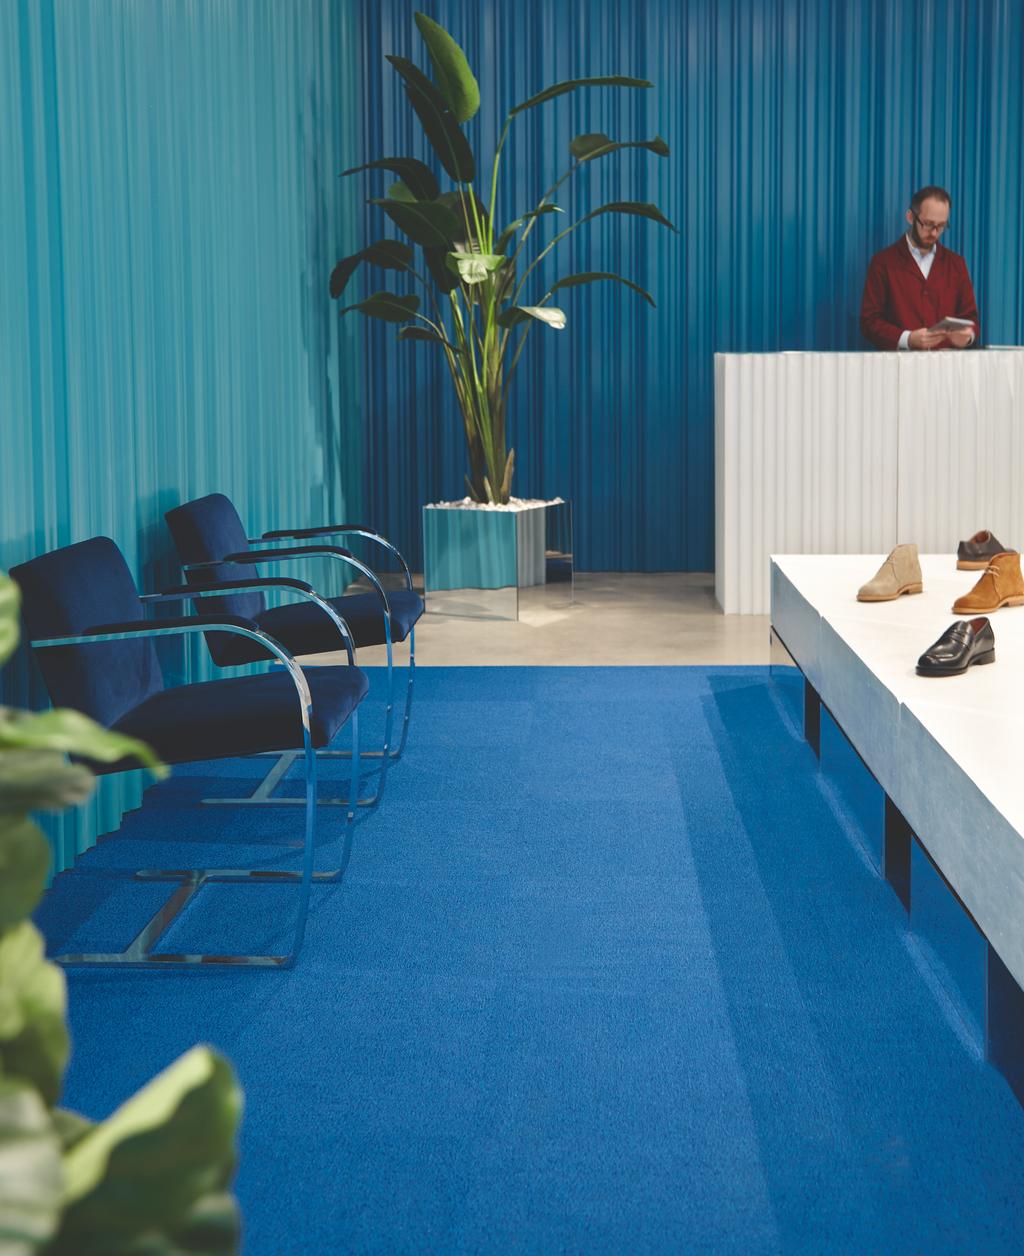 Sutton Carpet - Retail Jack Erwin Carpet Installation